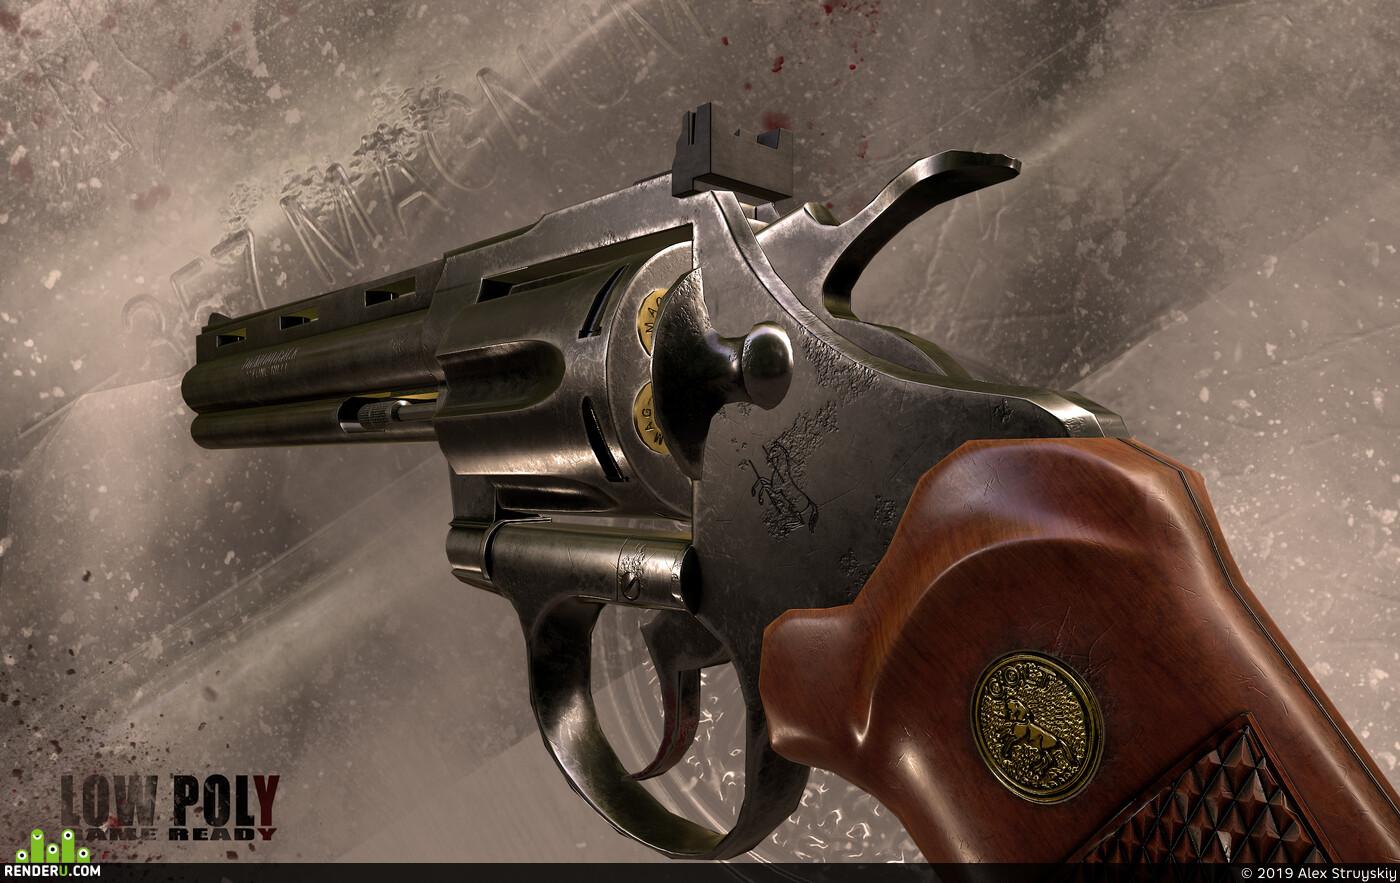 lowpoly, Maya, marmoset, game, Game-ready, gameready, gun, revolver, weapons